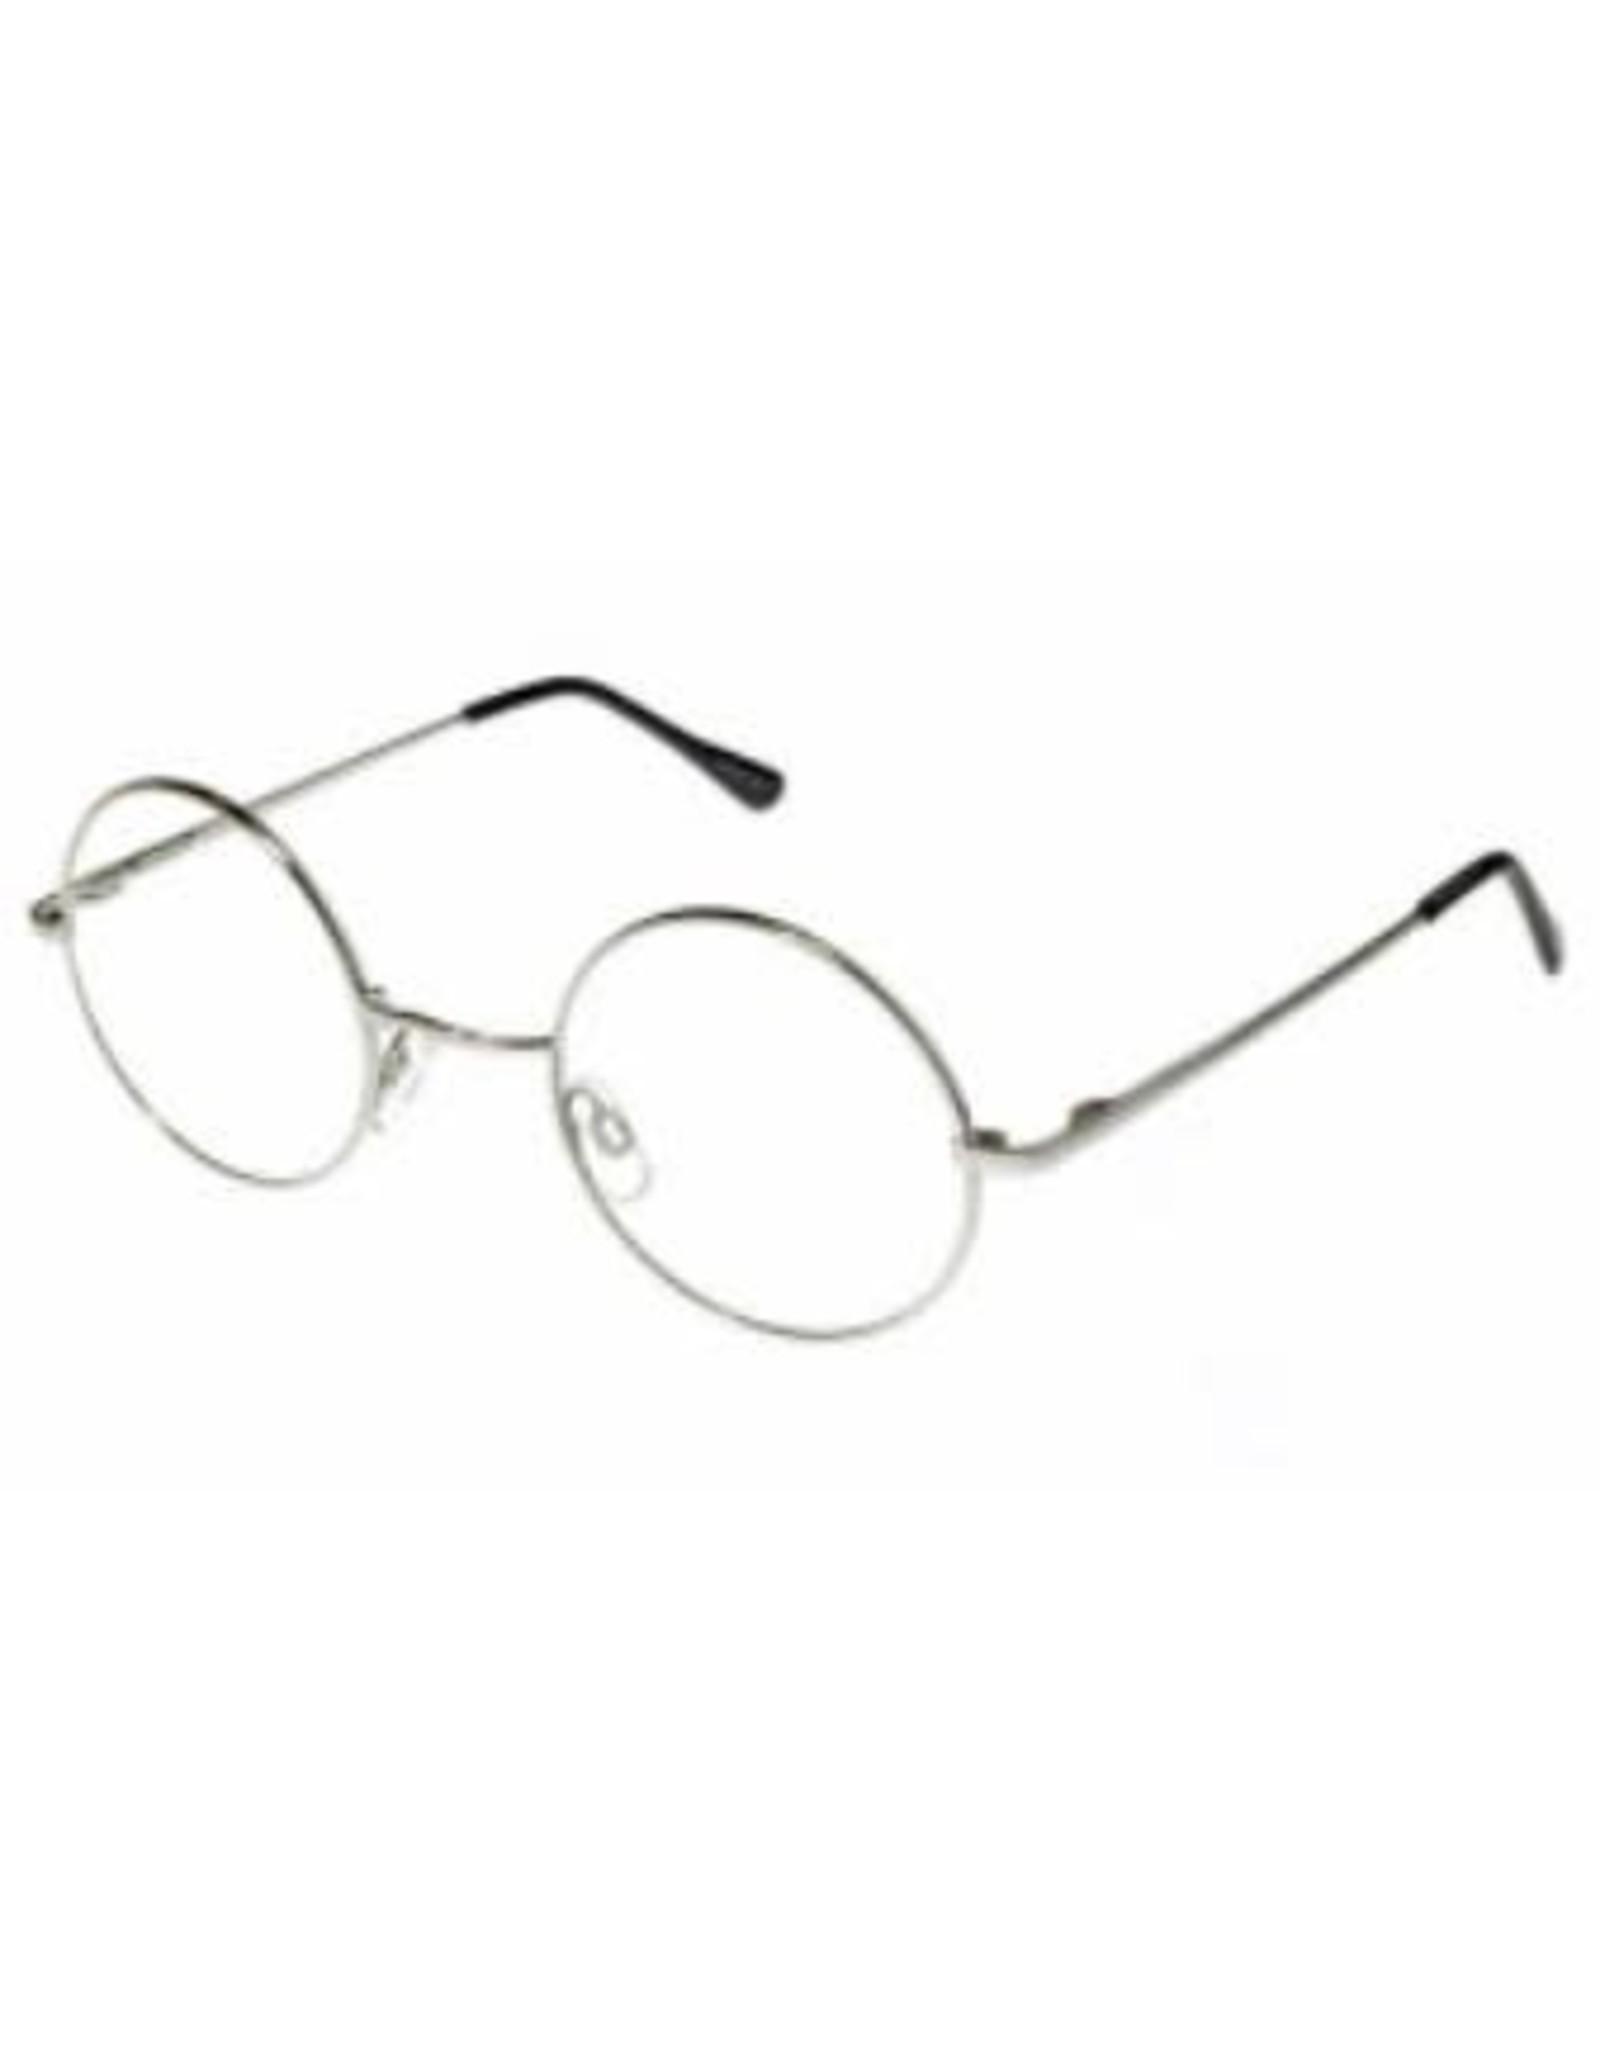 SKS Novelty Round Glasses